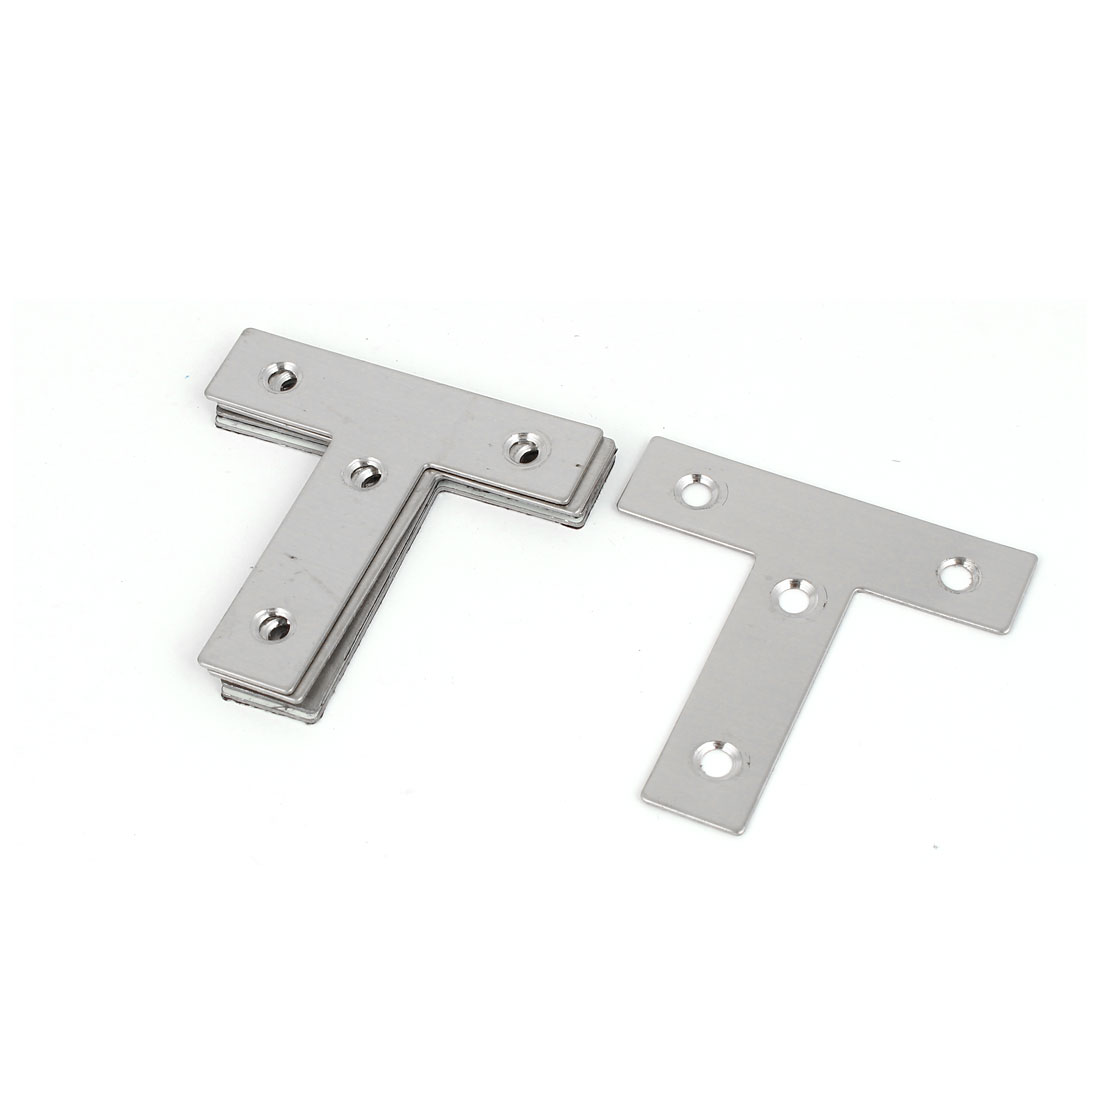 60mmx60mm T Shaped Stainless Steel Angle Bracket Corner Brace Fastener 5 Pcs